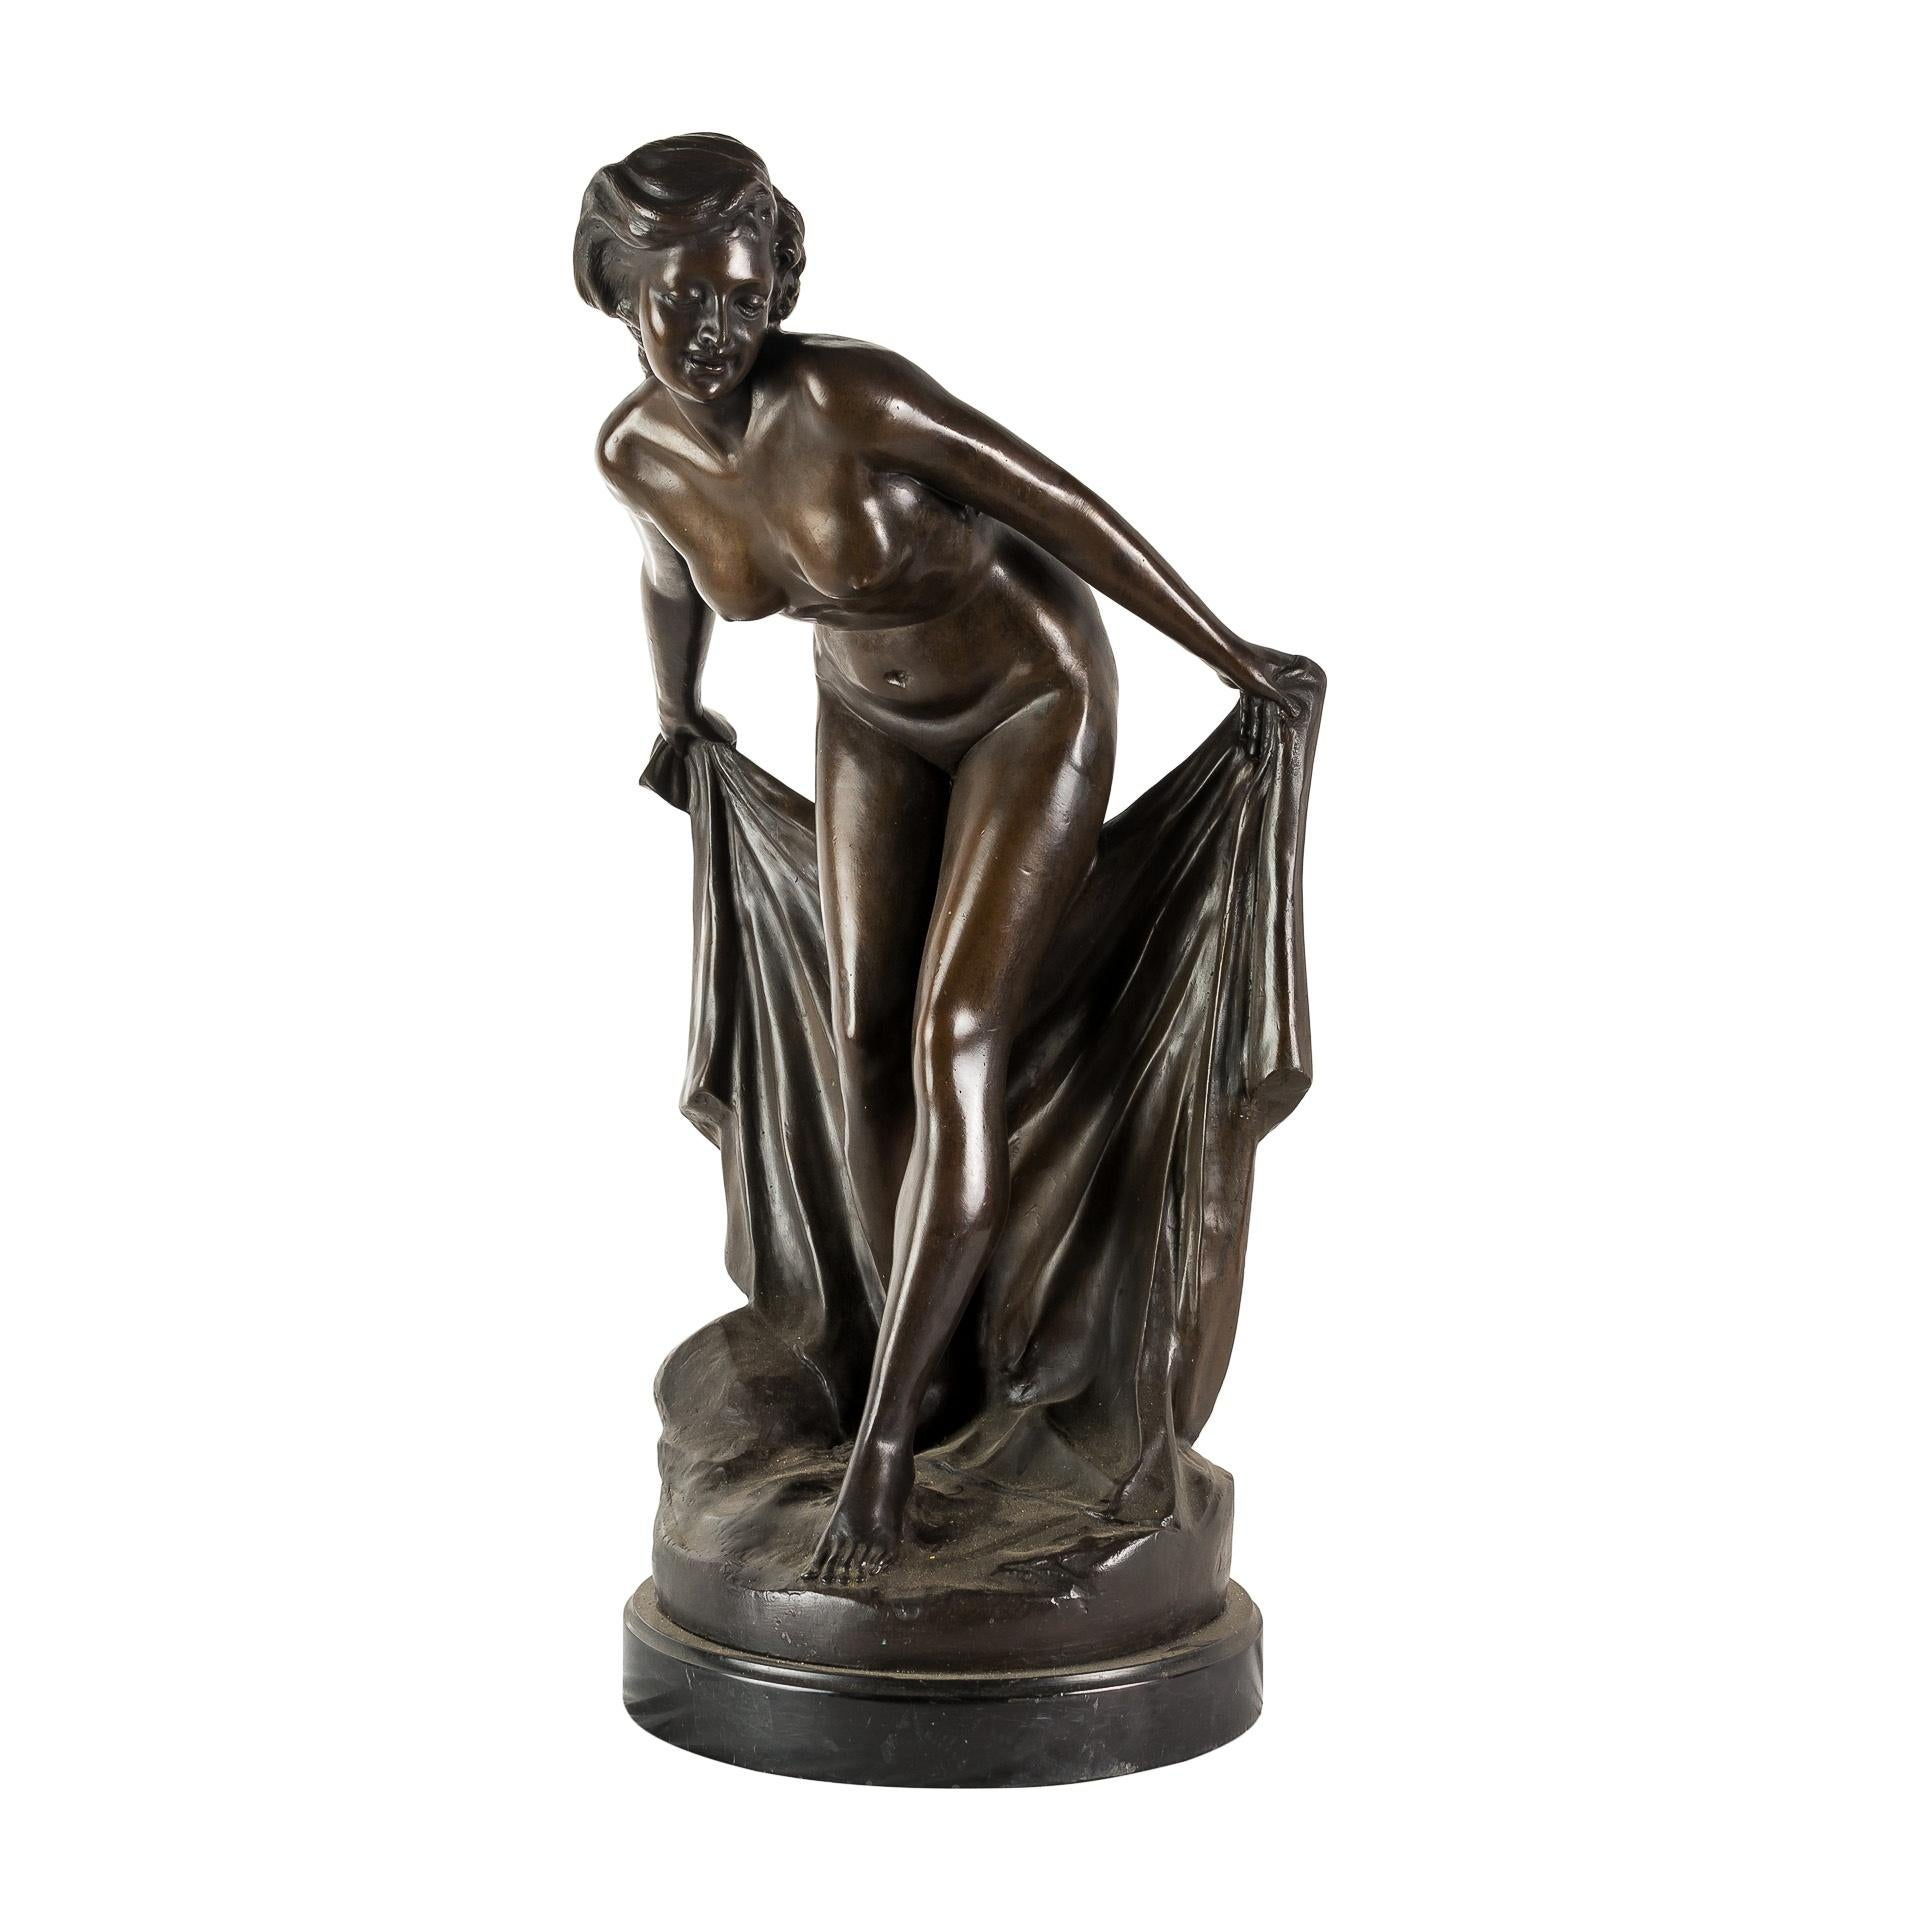 Italian Burnished Bronze Sculpture, Nude Venus, Italy, 19th Century